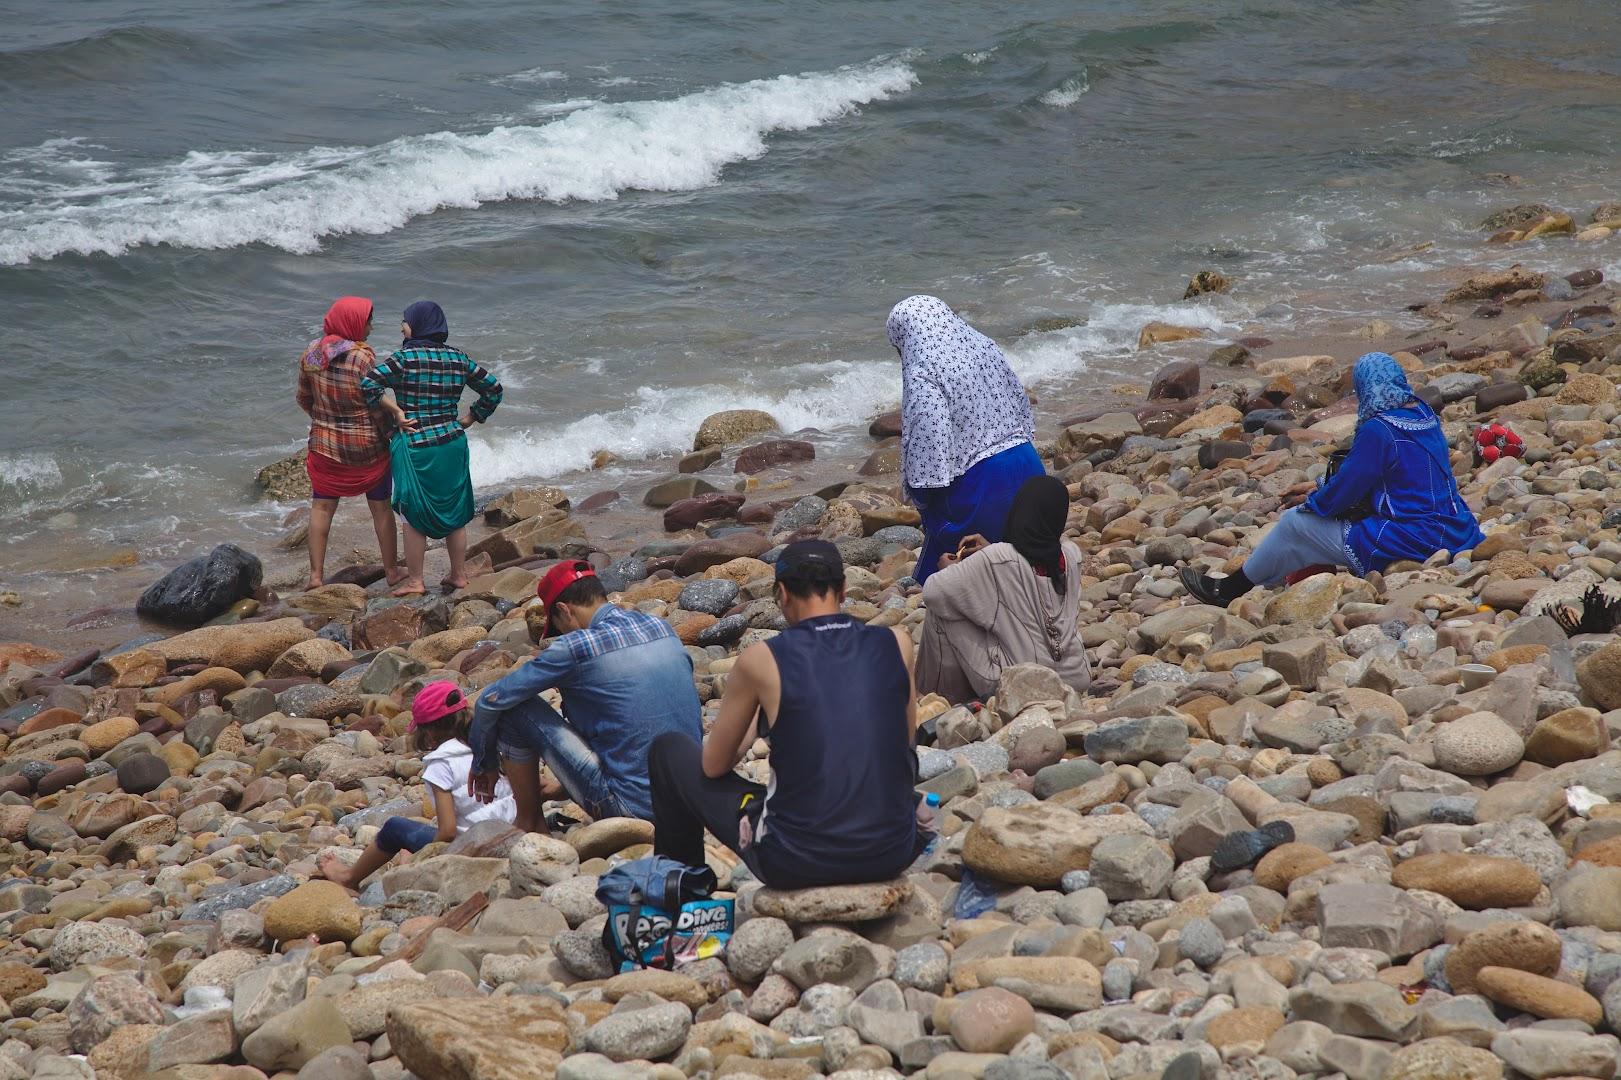 No bikins at the beach in Casablanca